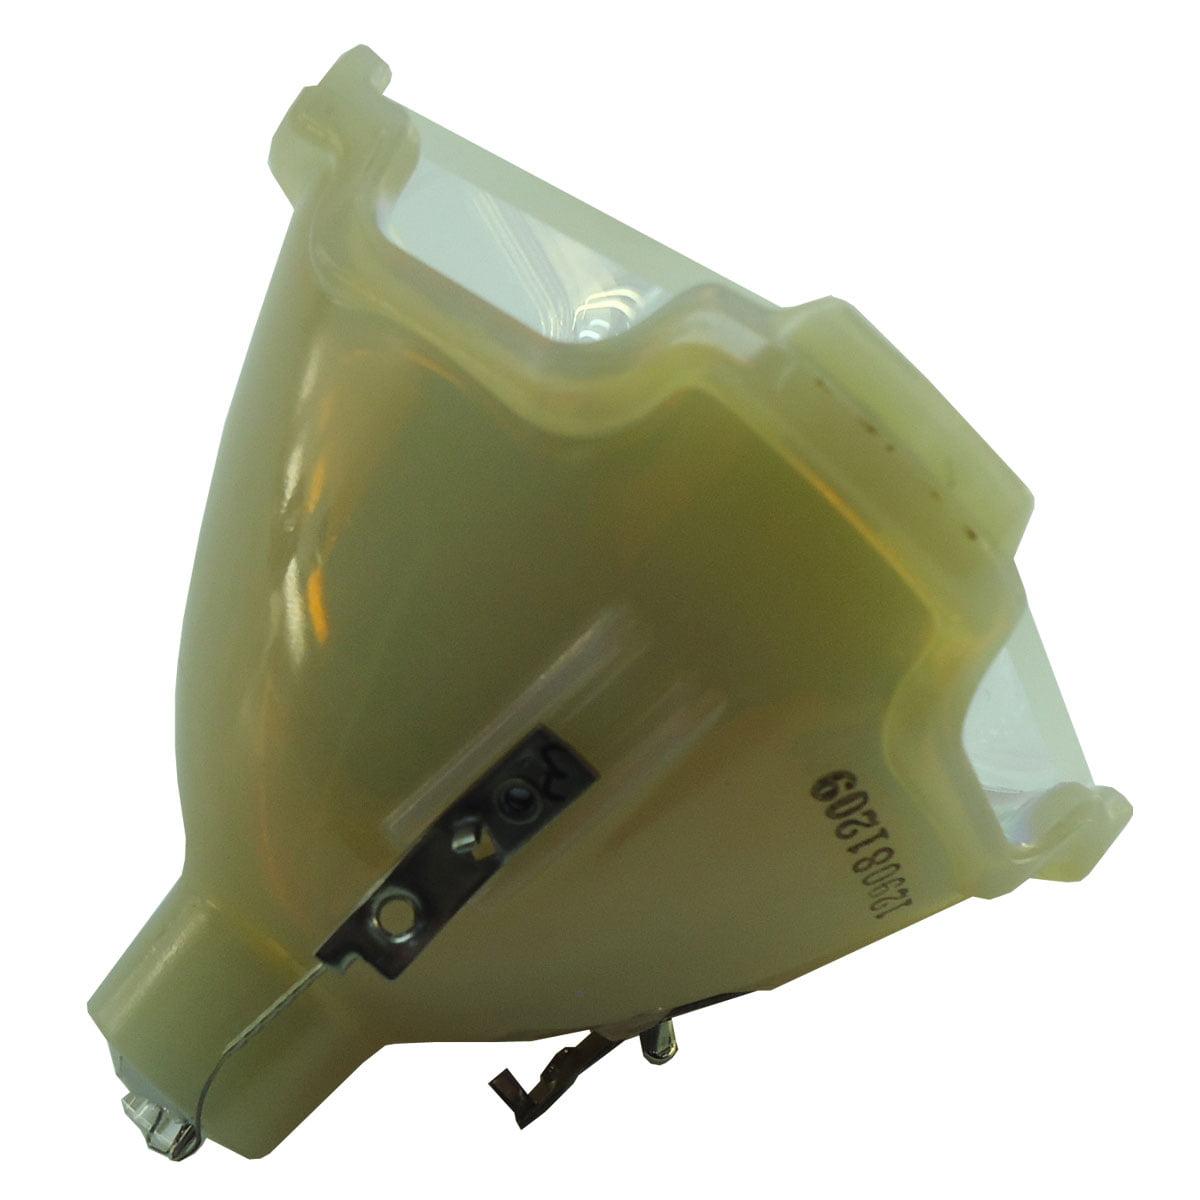 Lutema Platinum Bulb for Christie LS+58 Projector Lamp (Original Philips Inside) - image 4 de 5